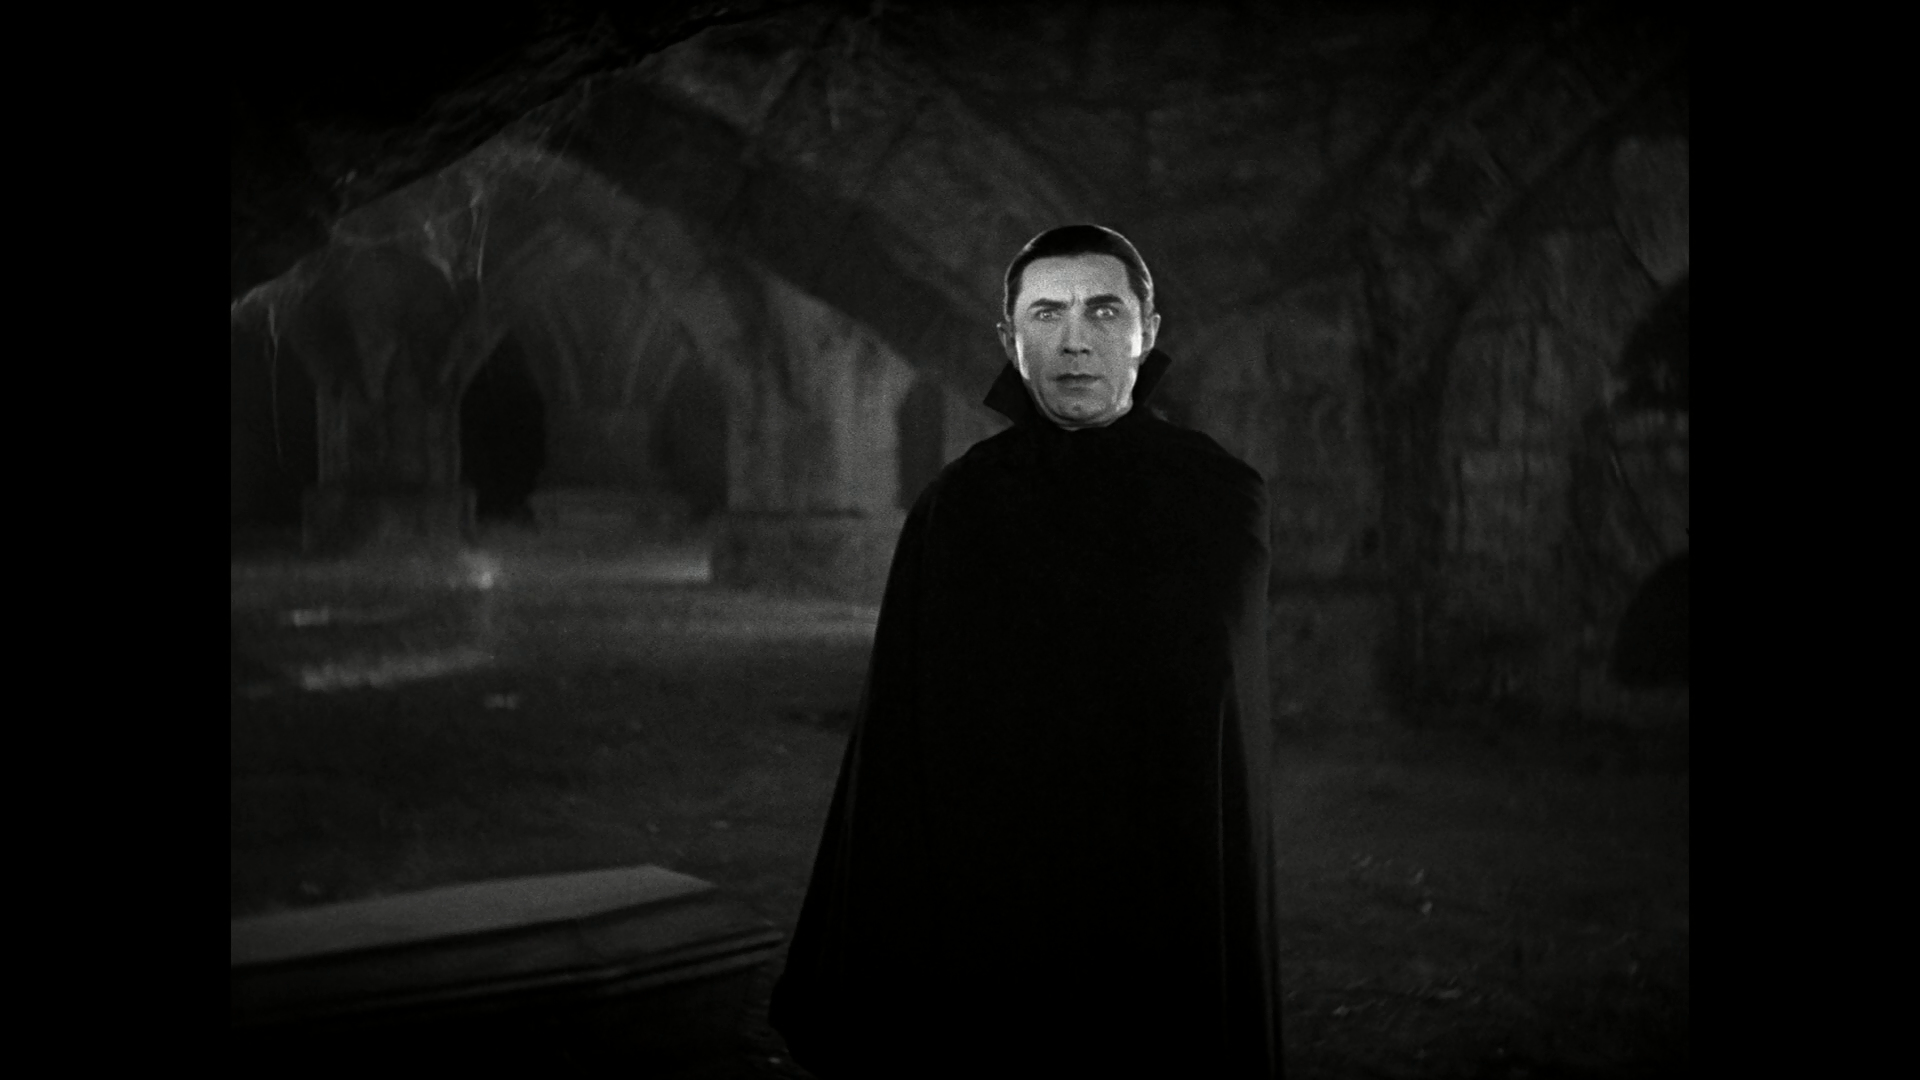 158. Dracula (1931)